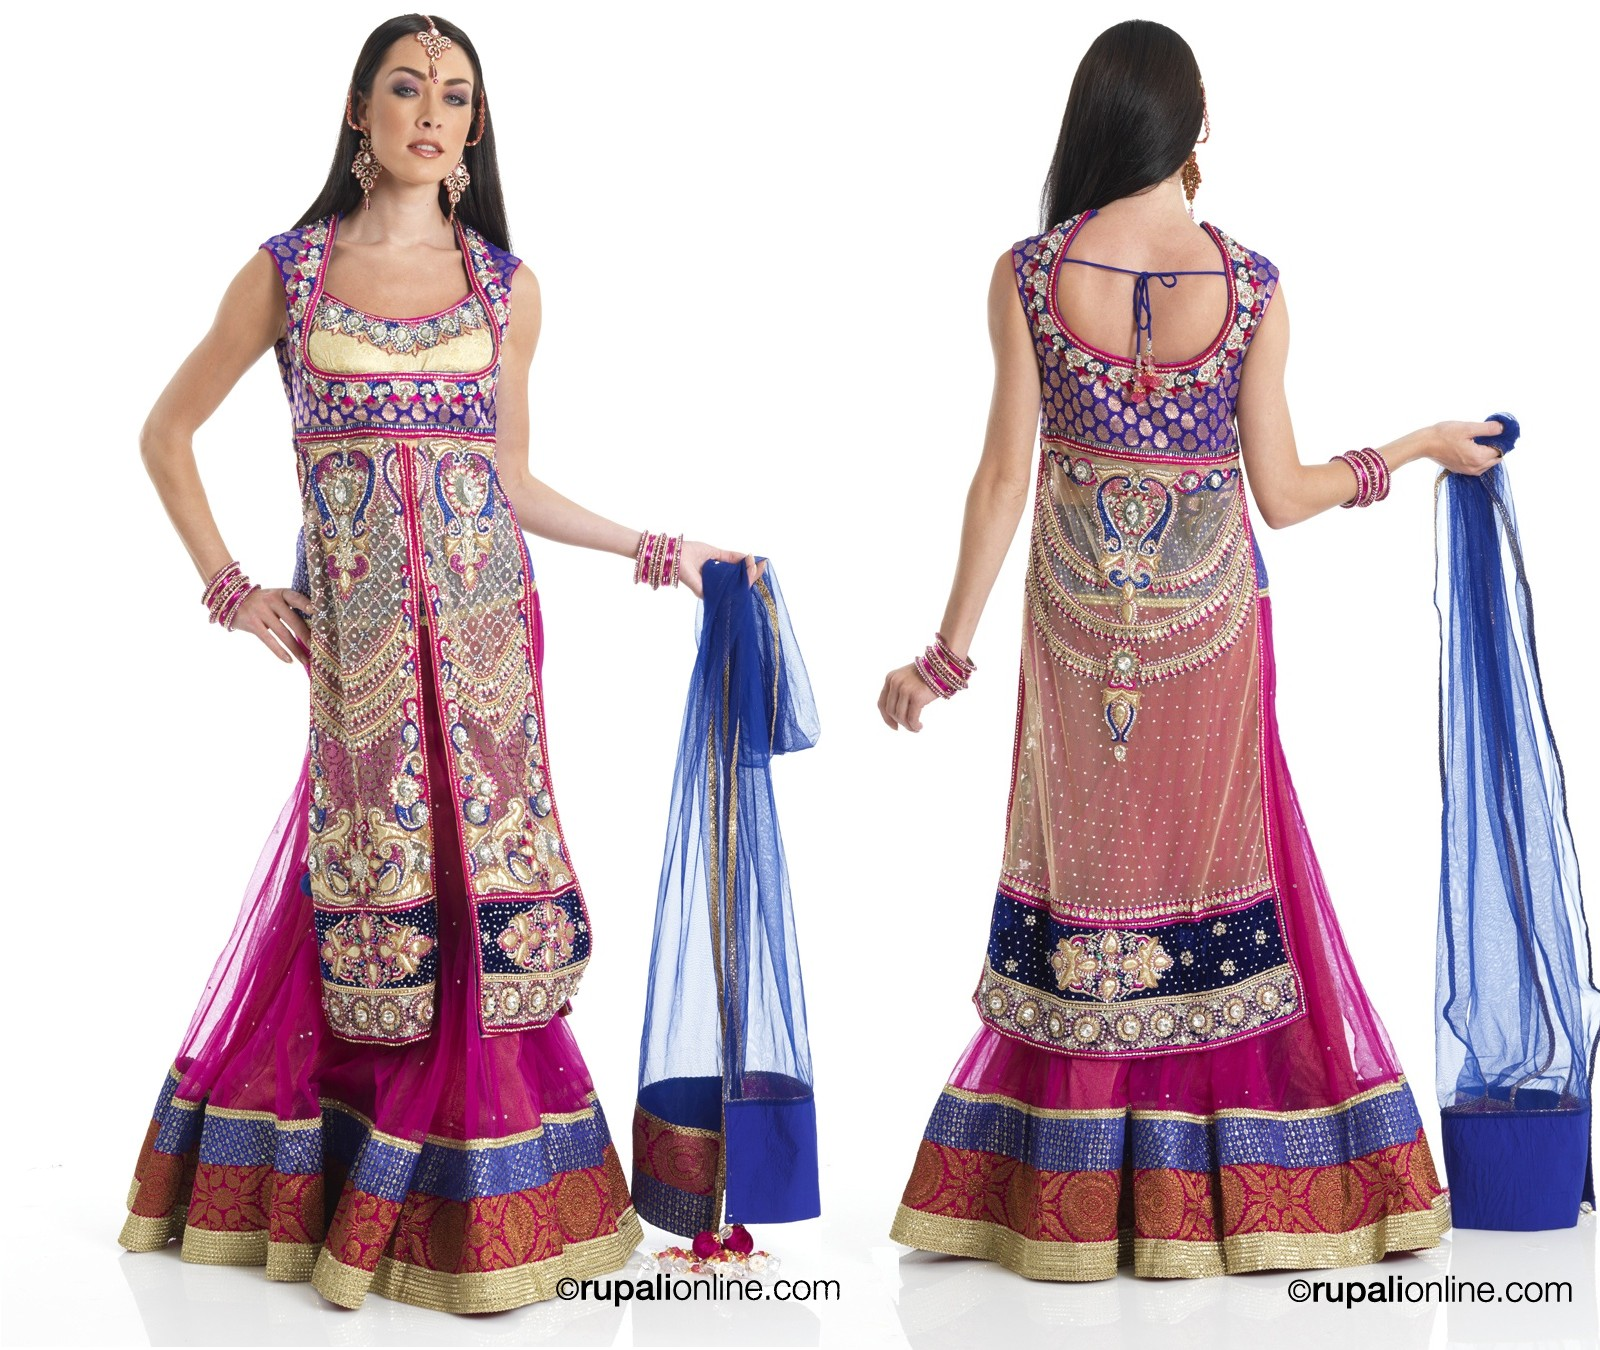 Shirt design girl pakistani - Anarkali Latest Dresses 2012